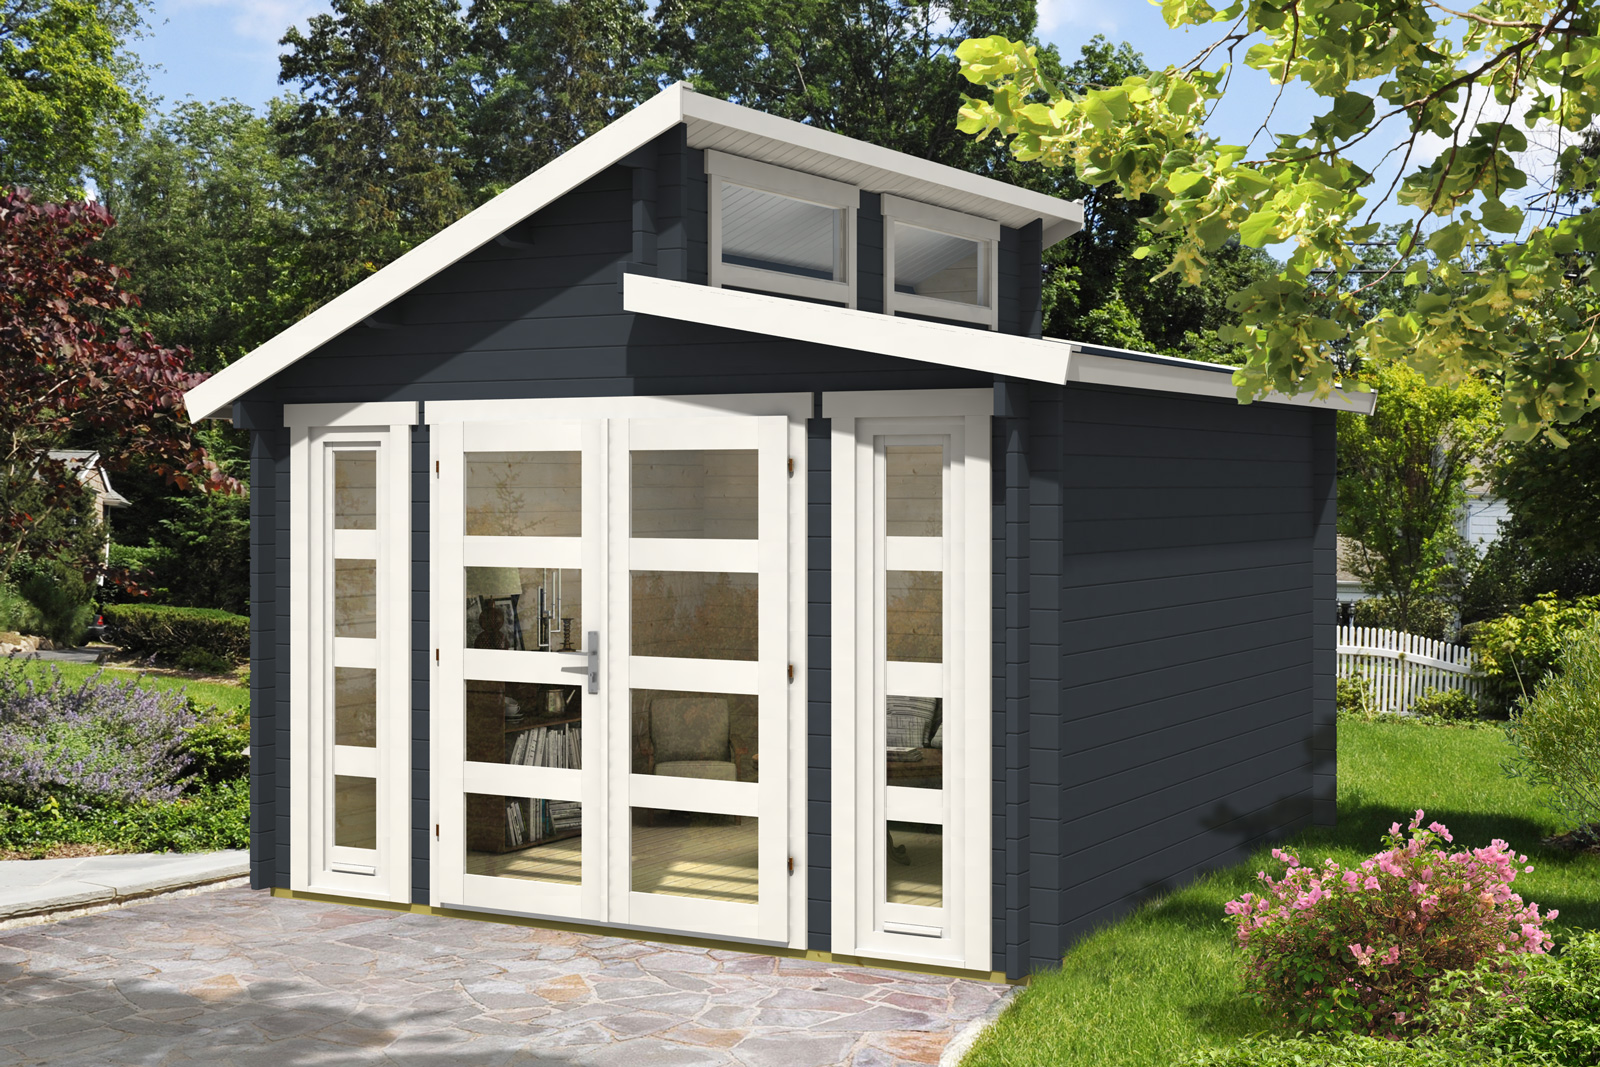 Doppel pultdach gartenhaus modell vinea 40 for Gartenhauser mit pultdach